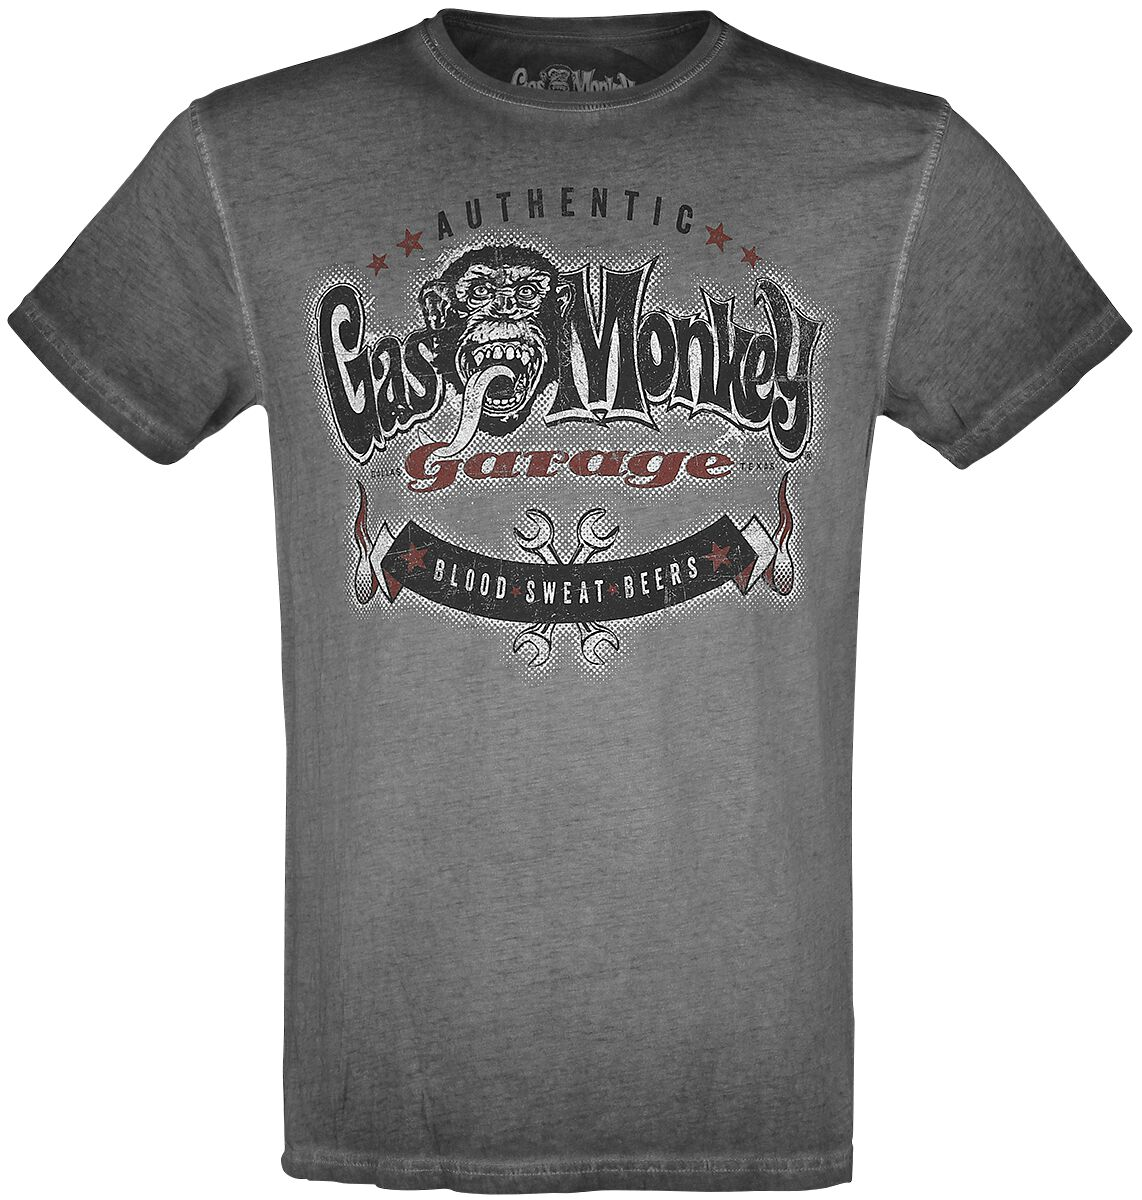 Gas Monkey Garage Blood, Sweat, Beers!  T-Shirt  grau